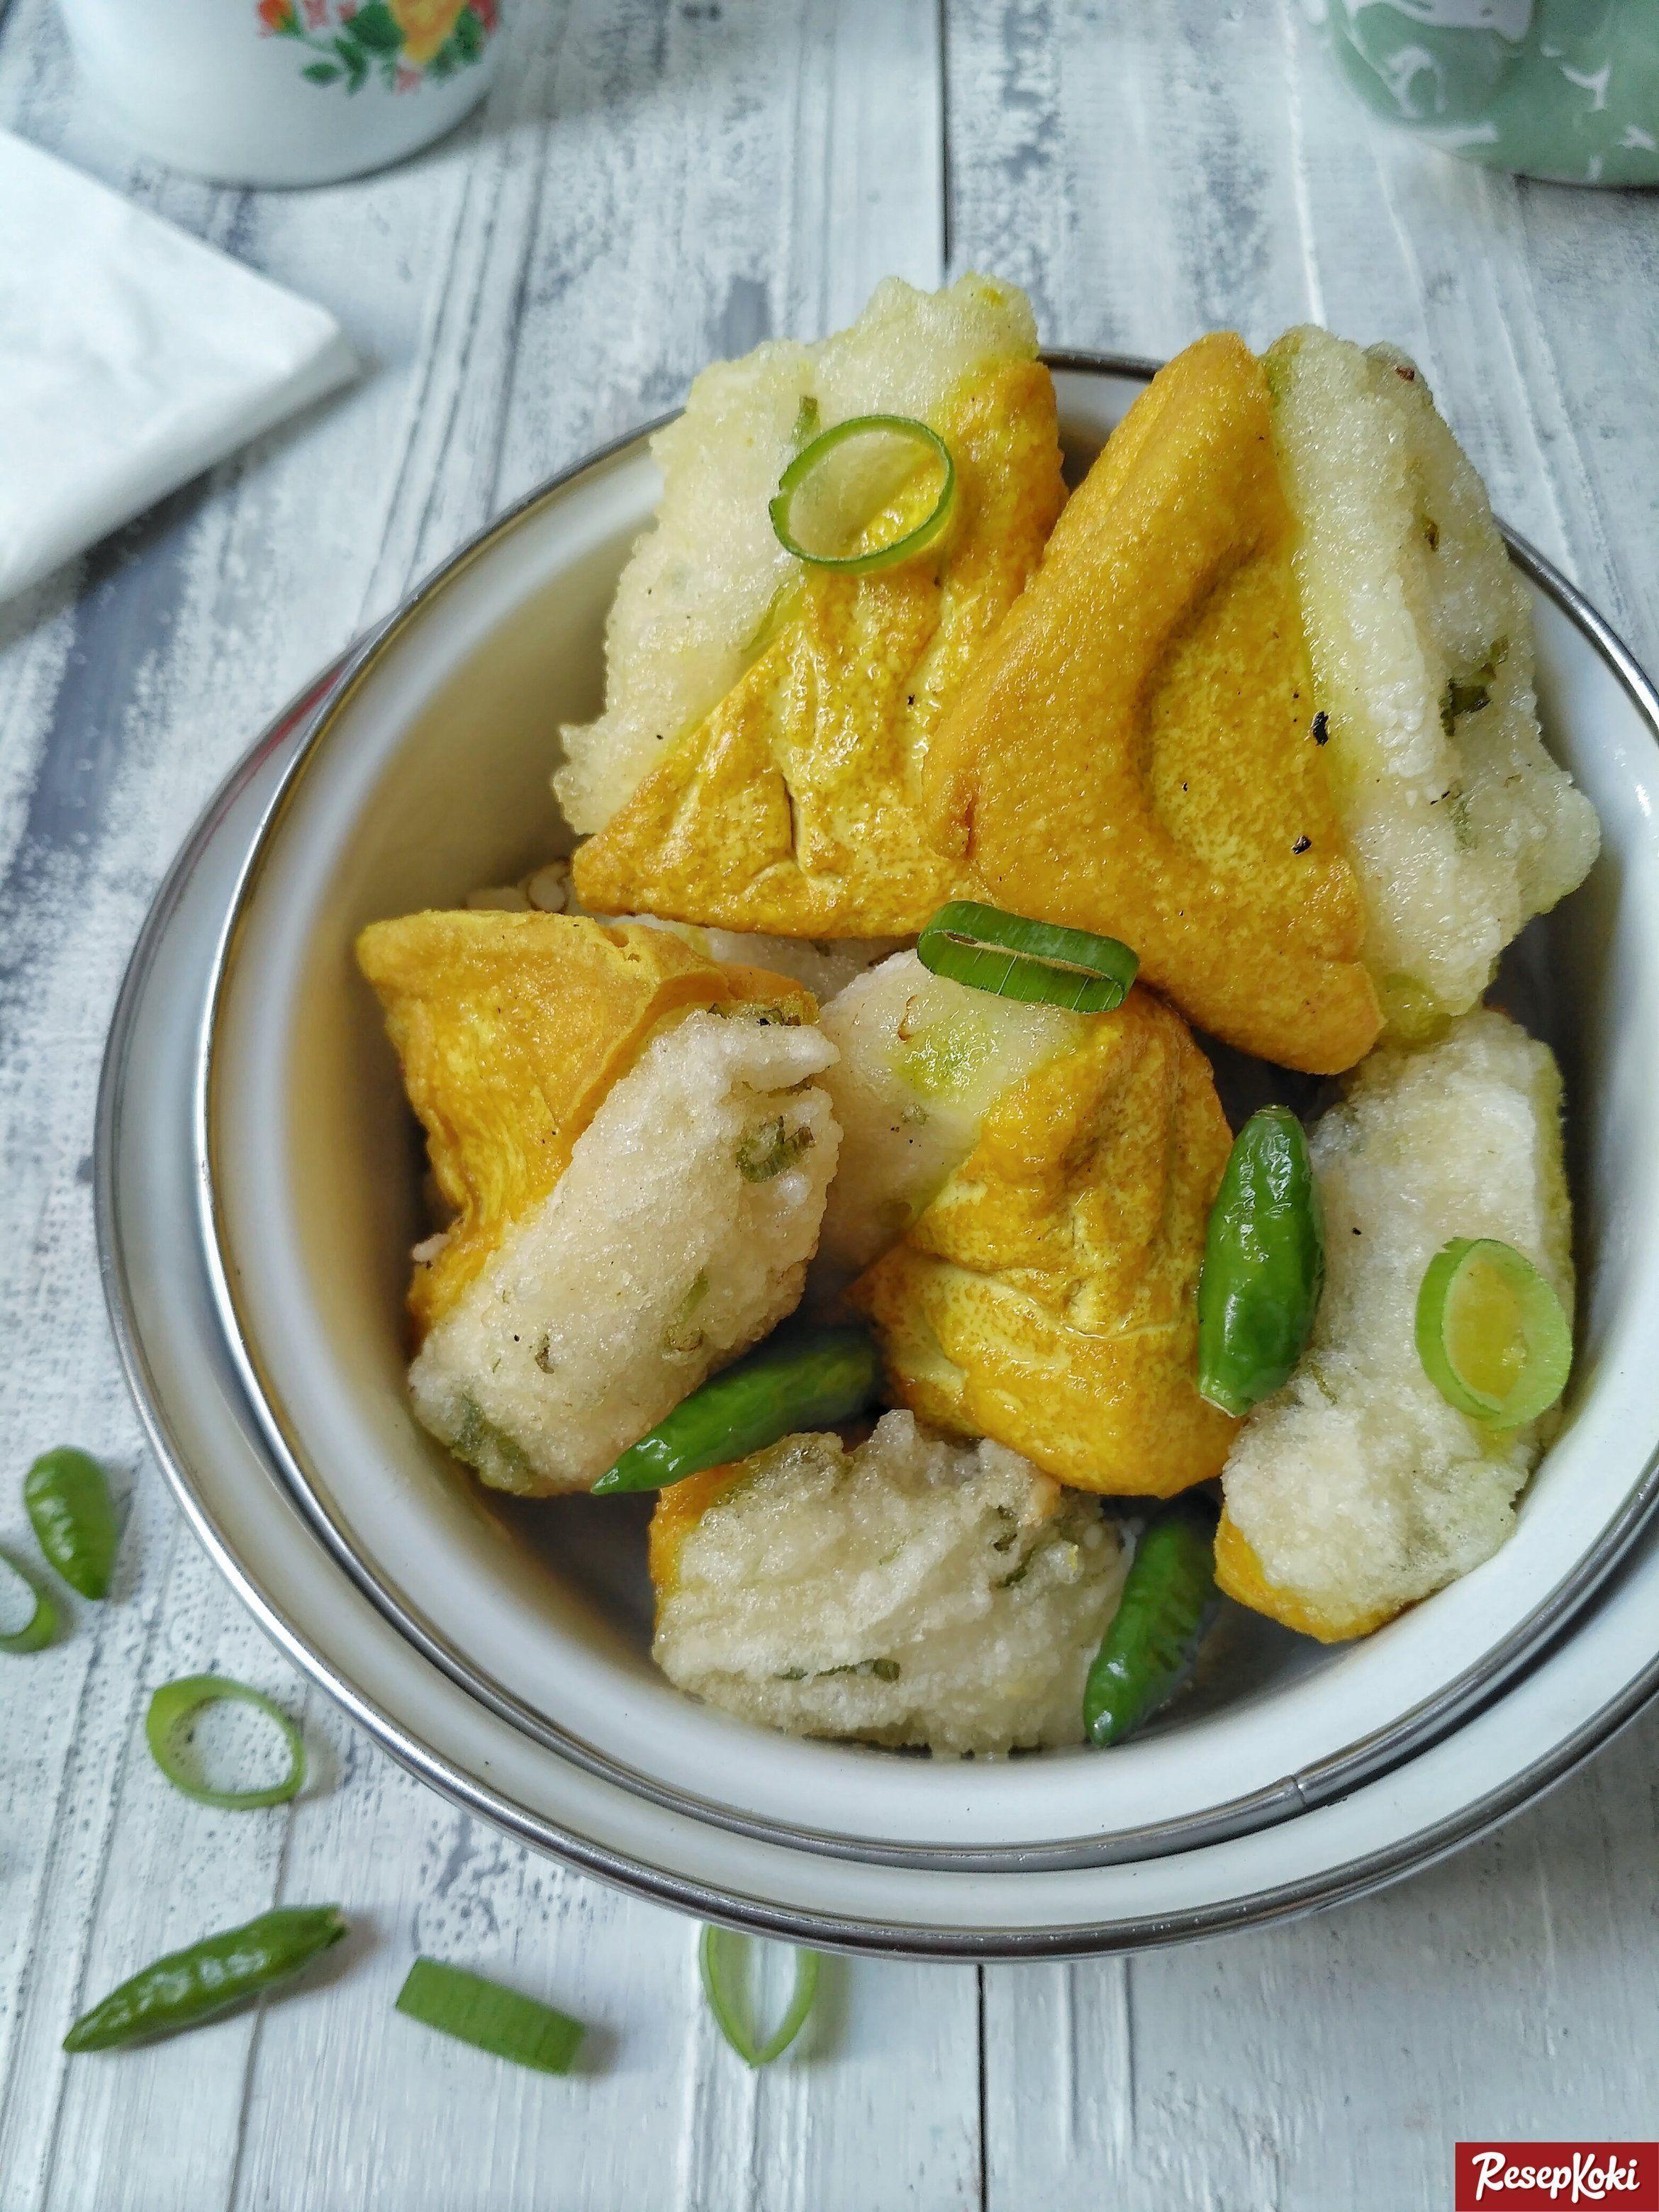 Tahu Aci Gurih Kenyal Asli Khas Tegal Resep Resepkoki Resep Resep Tahu Makanan Resep Masakan Asia